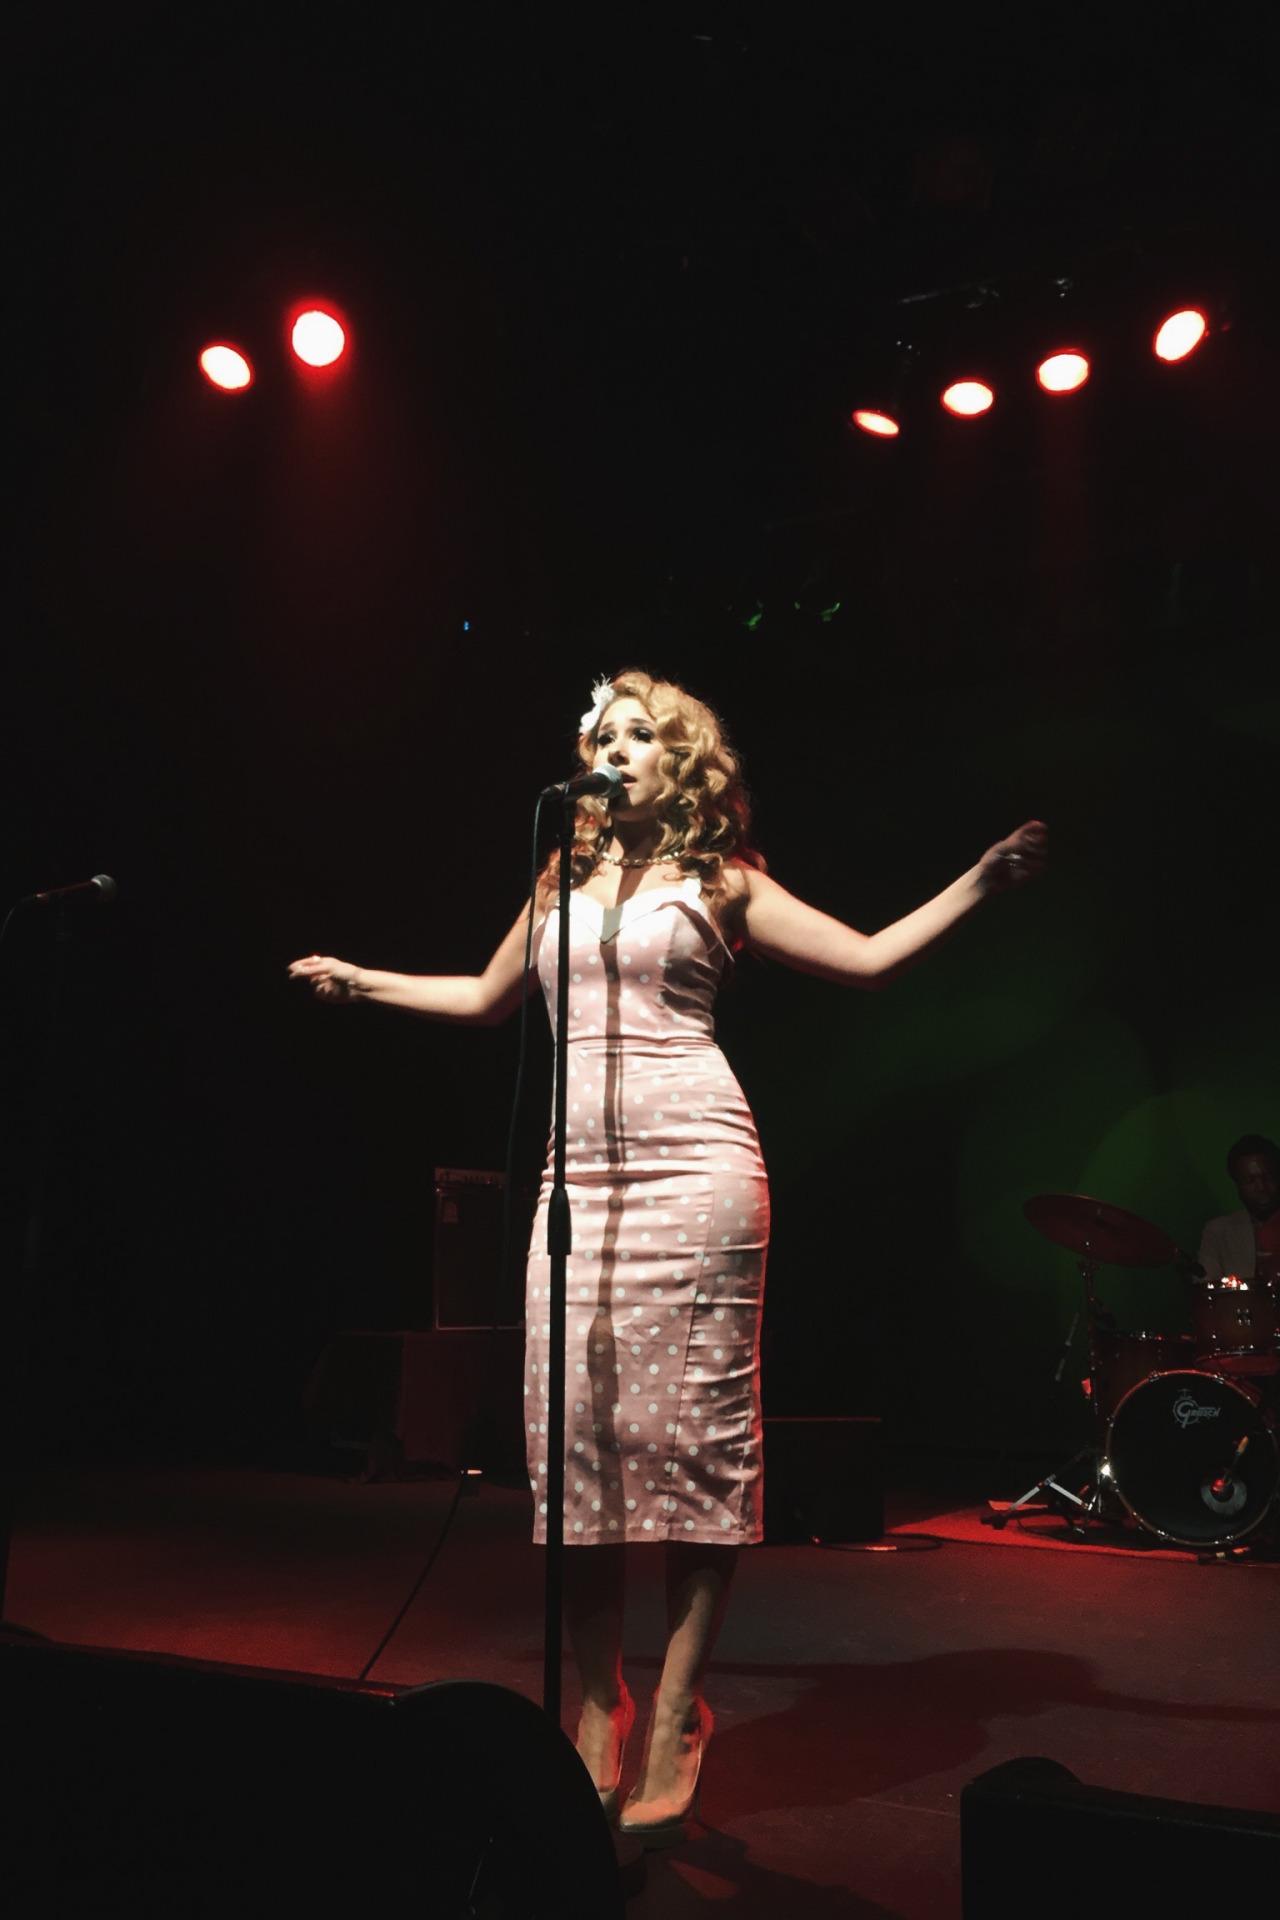 Haley Reinhart Pmj Tour